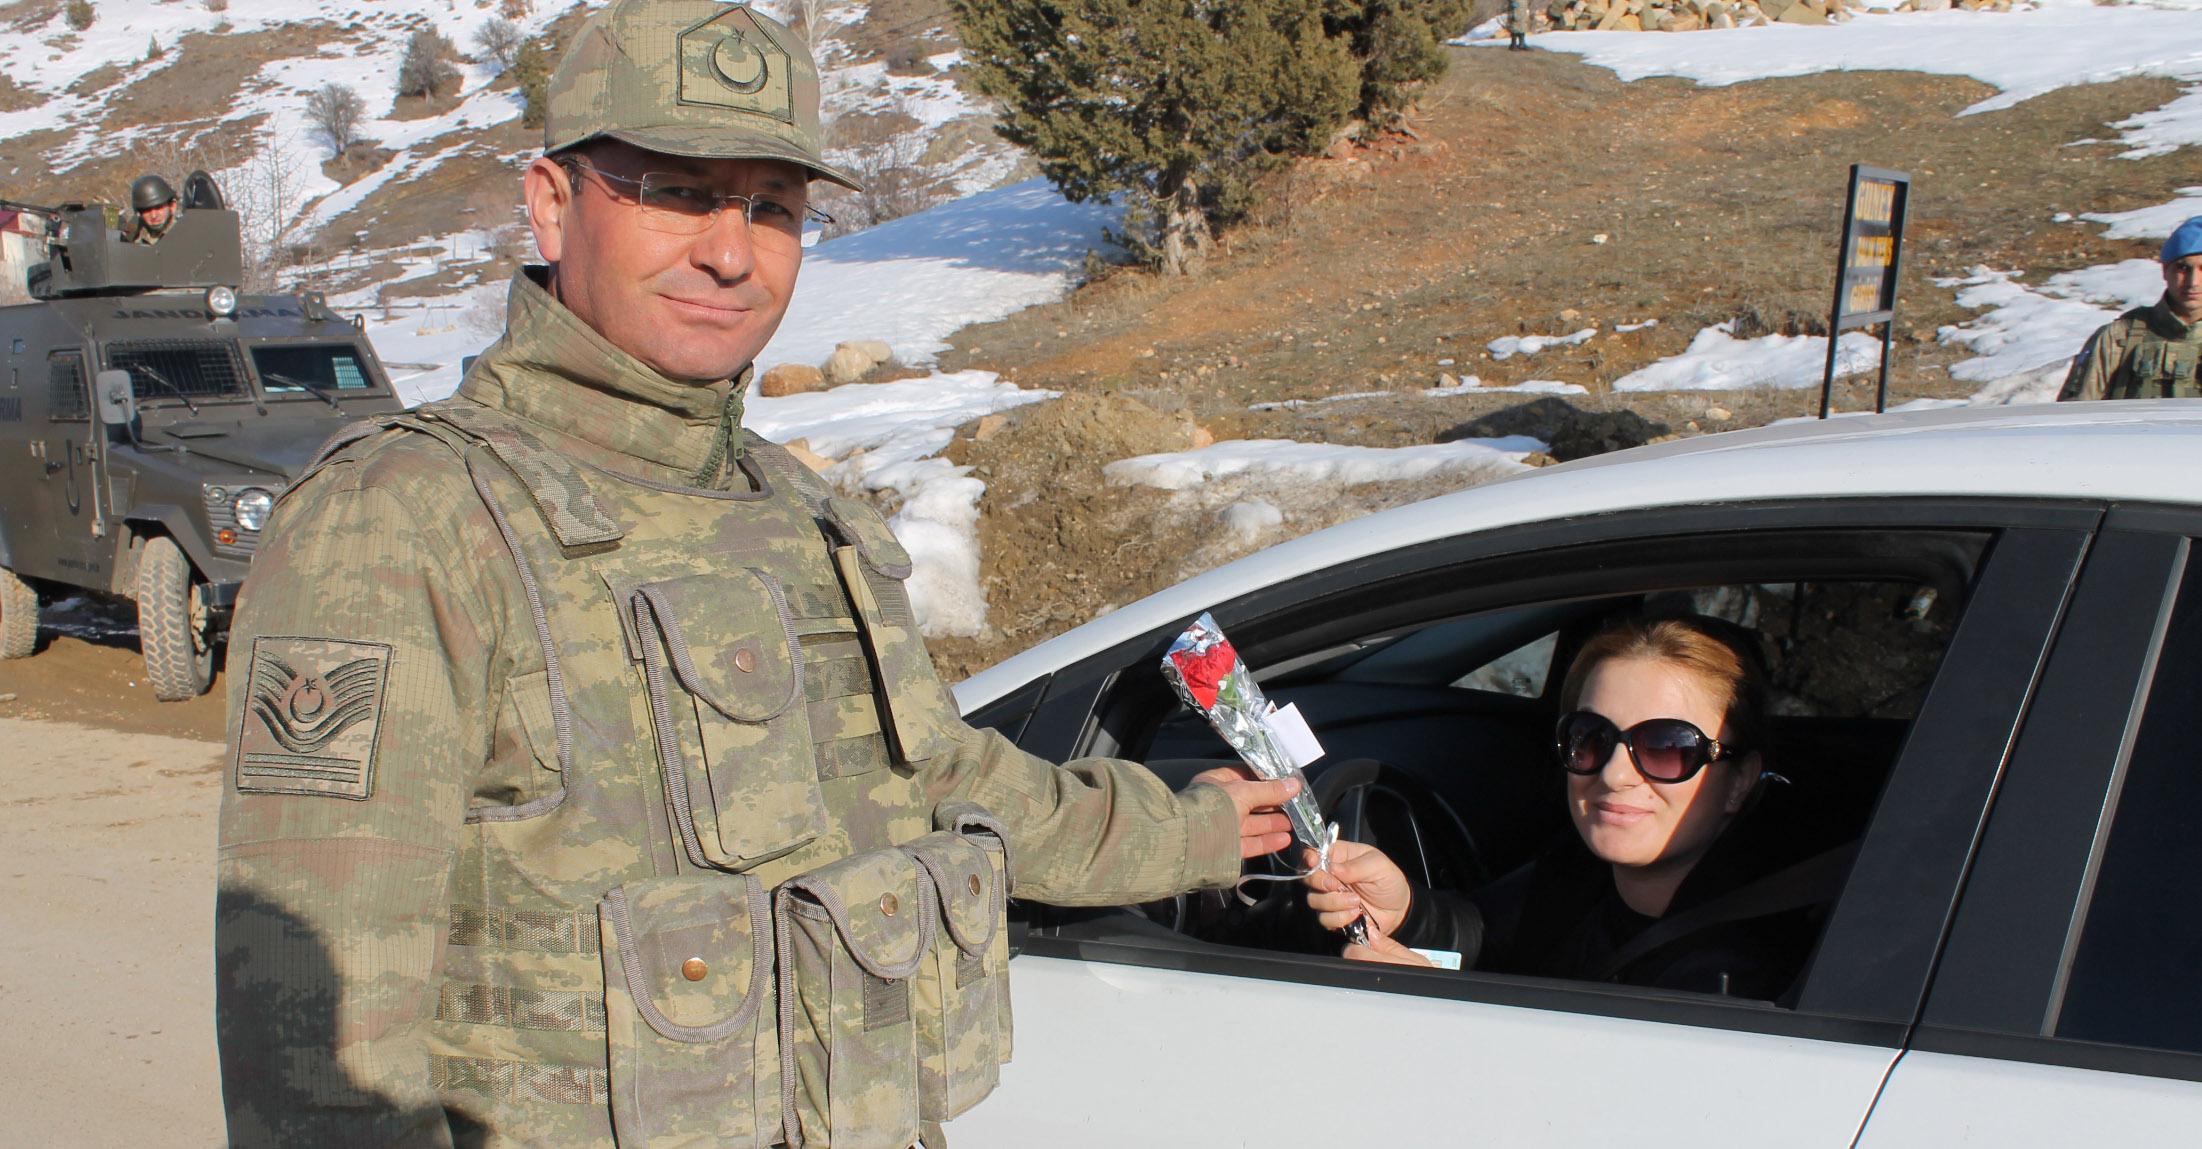 İlçe Jandarma Karanfil Dağıttı